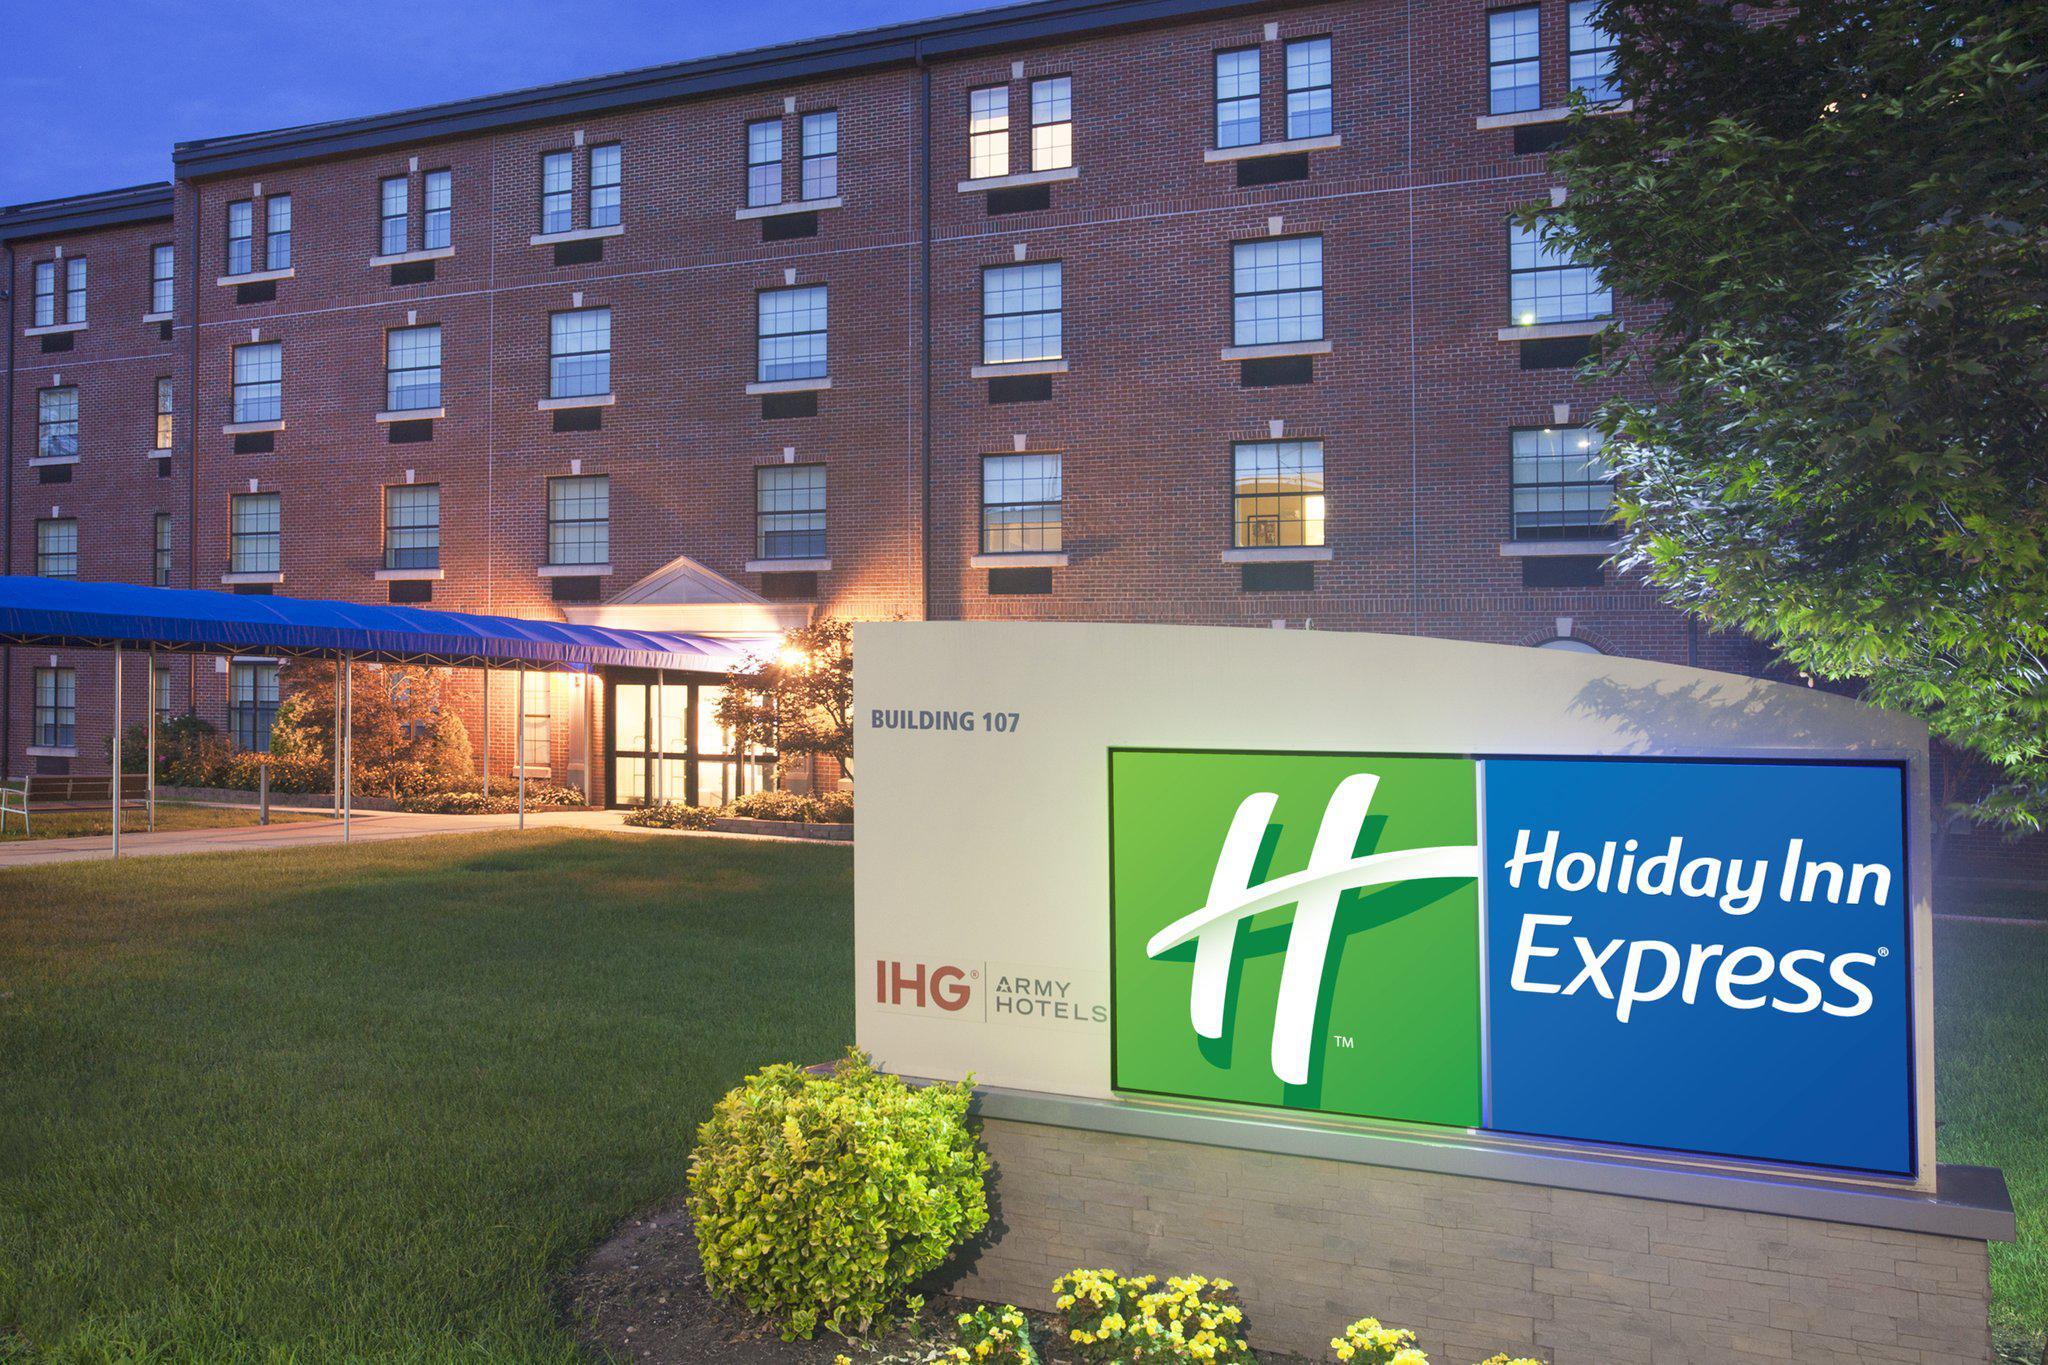 Holiday Inn Express Building 107